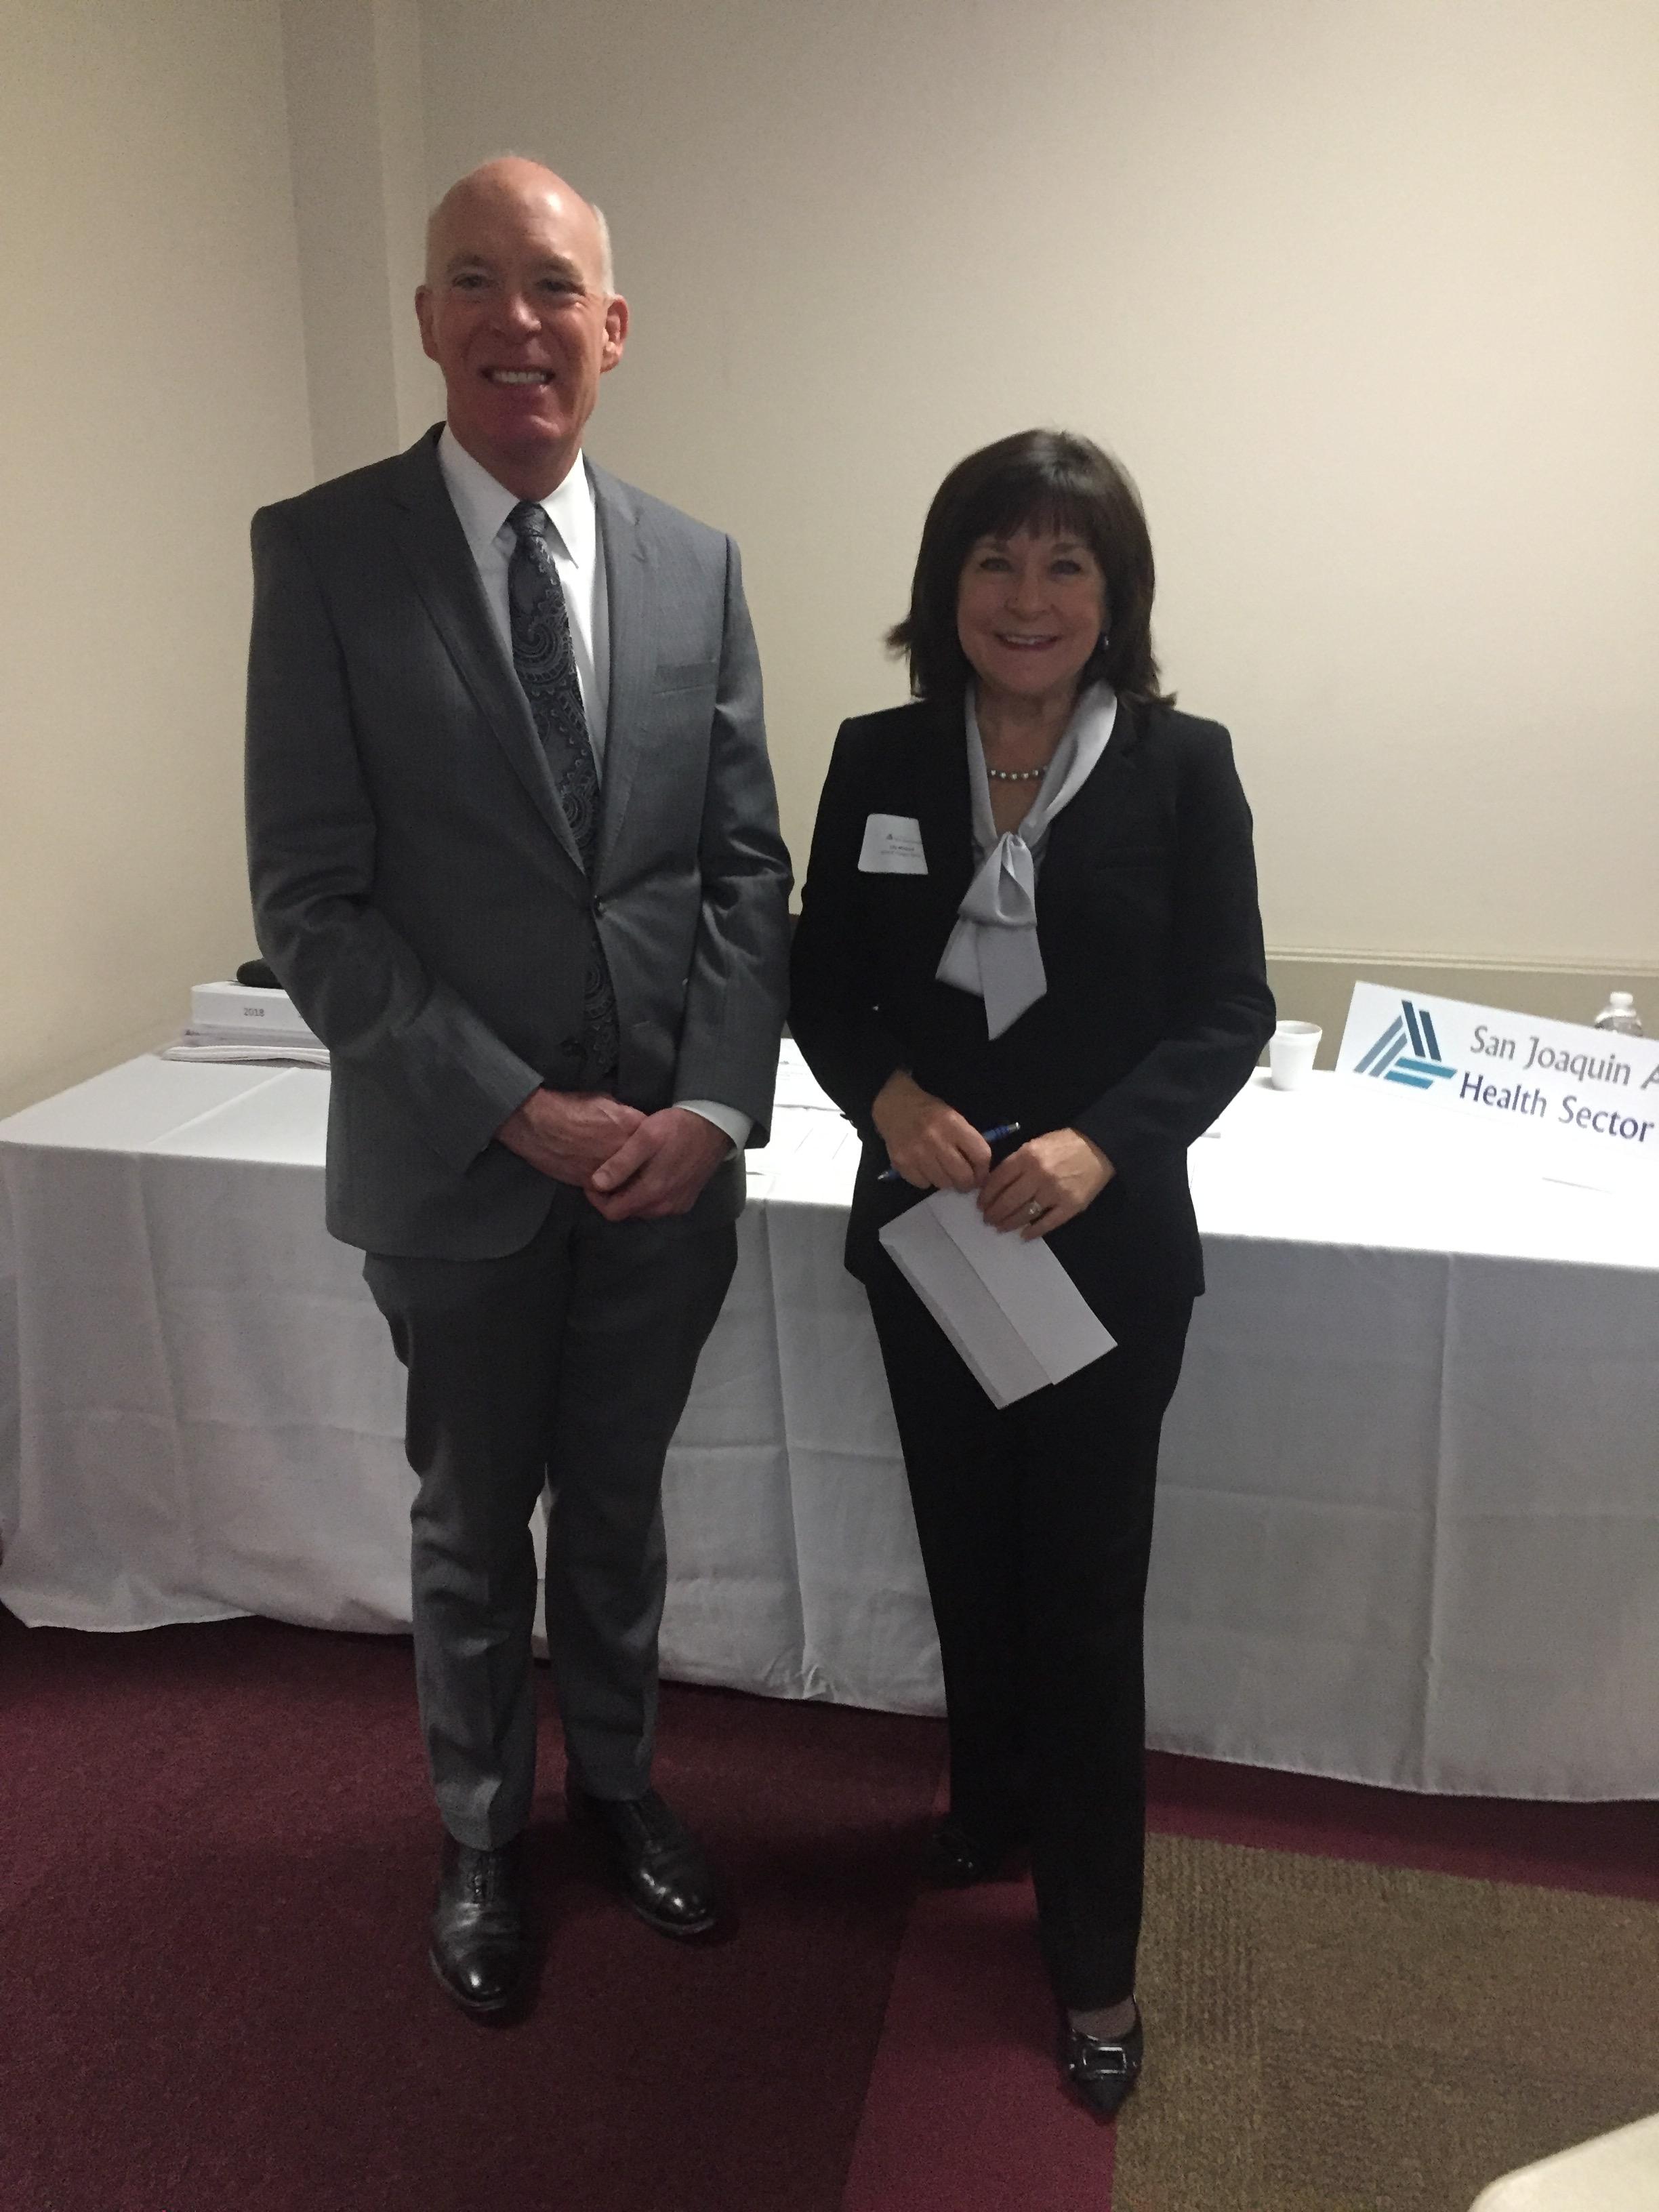 David Culberson and Lita Wallach